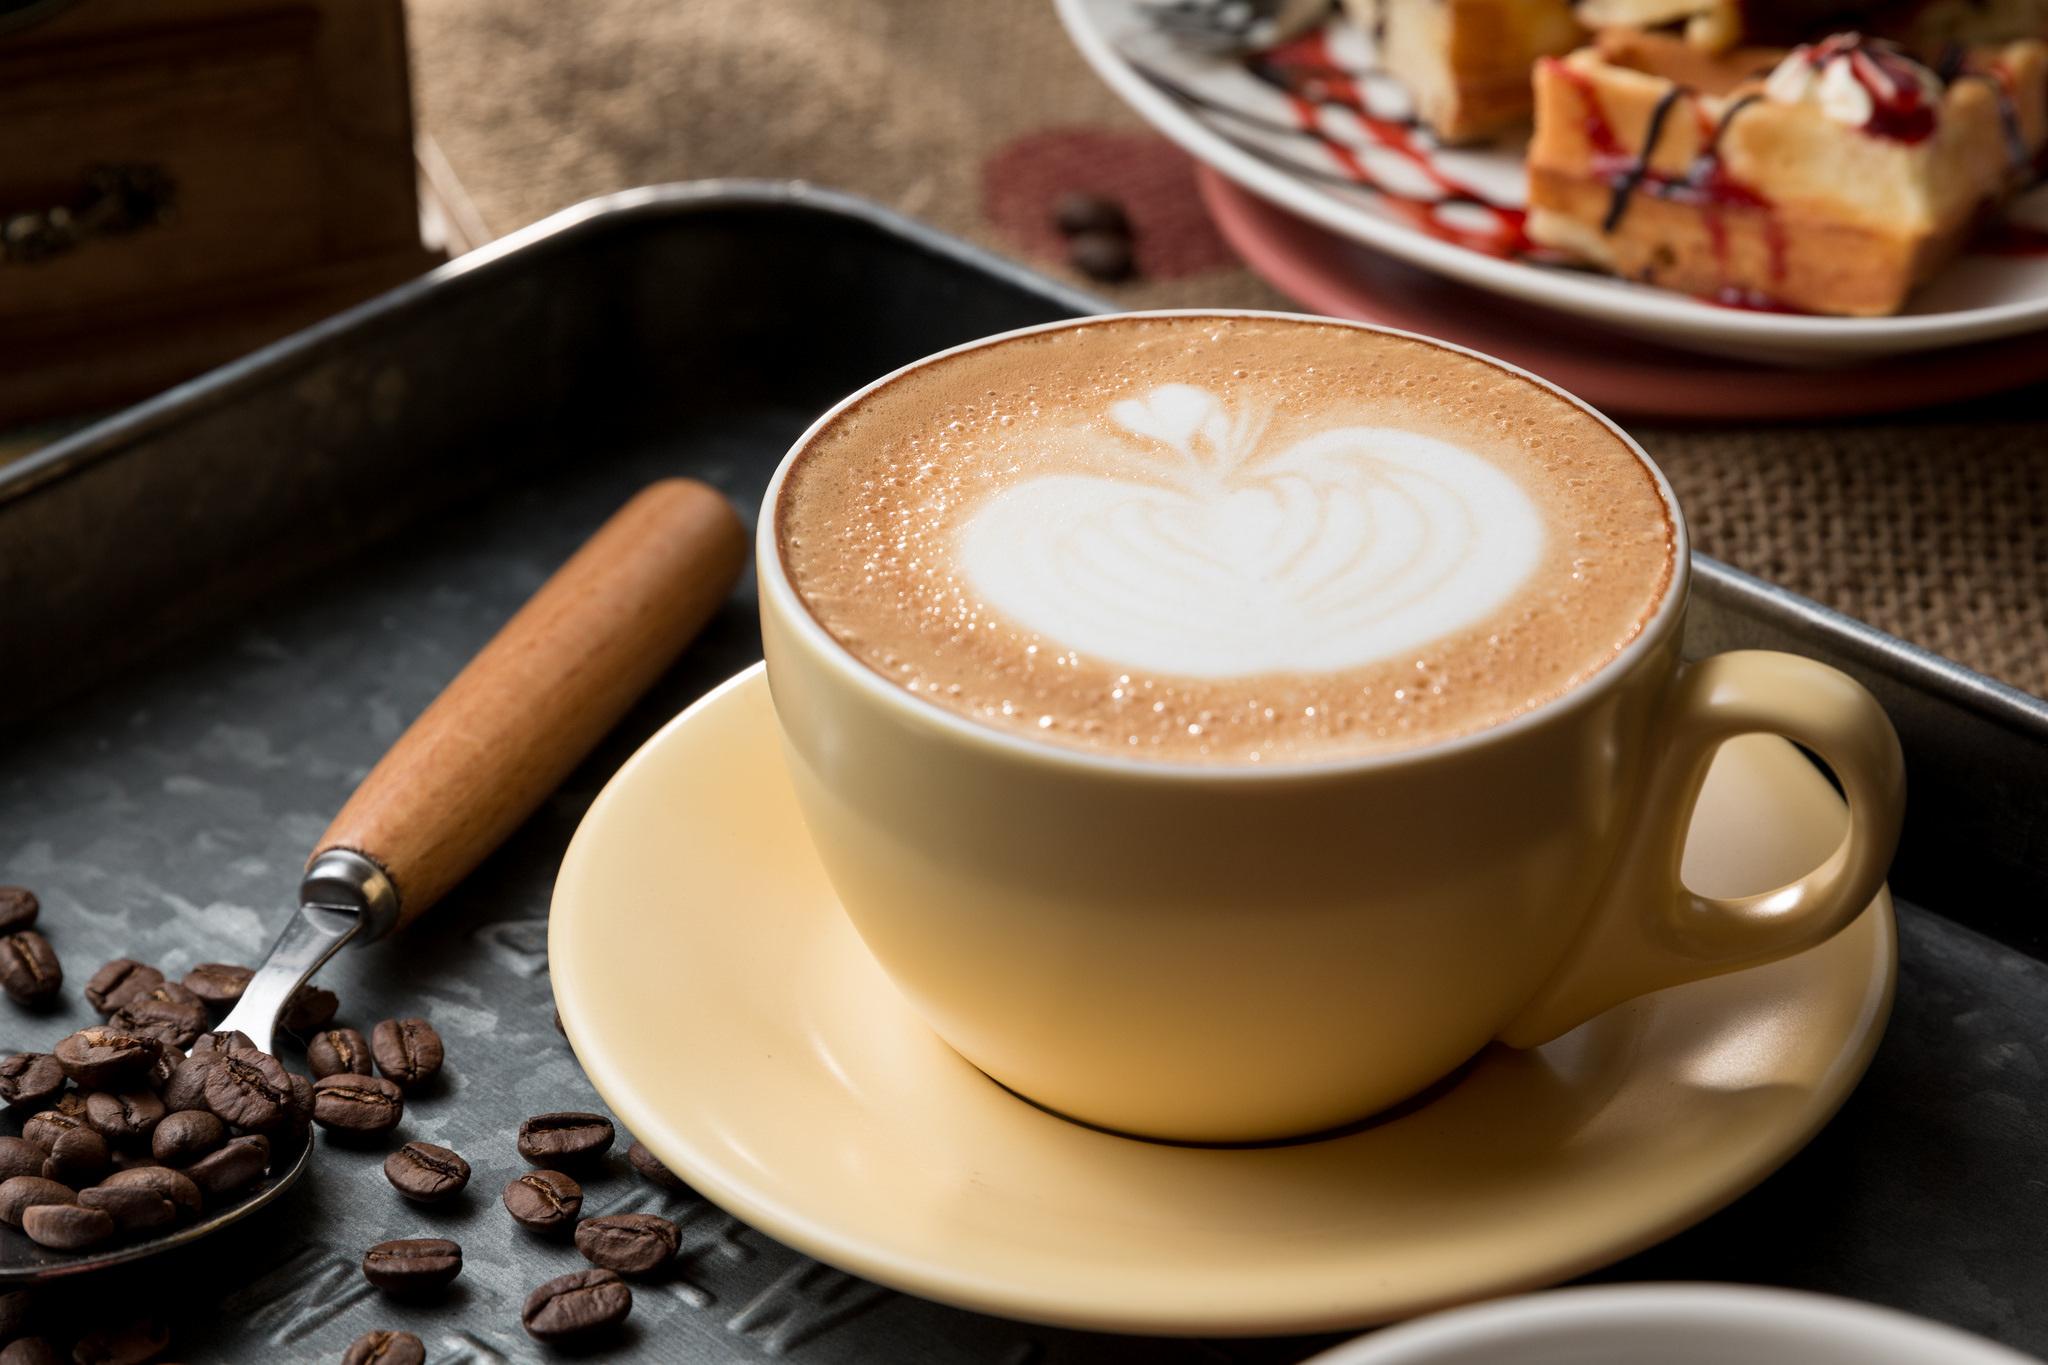 Coffee Coffee Beans Cup 2048x1365